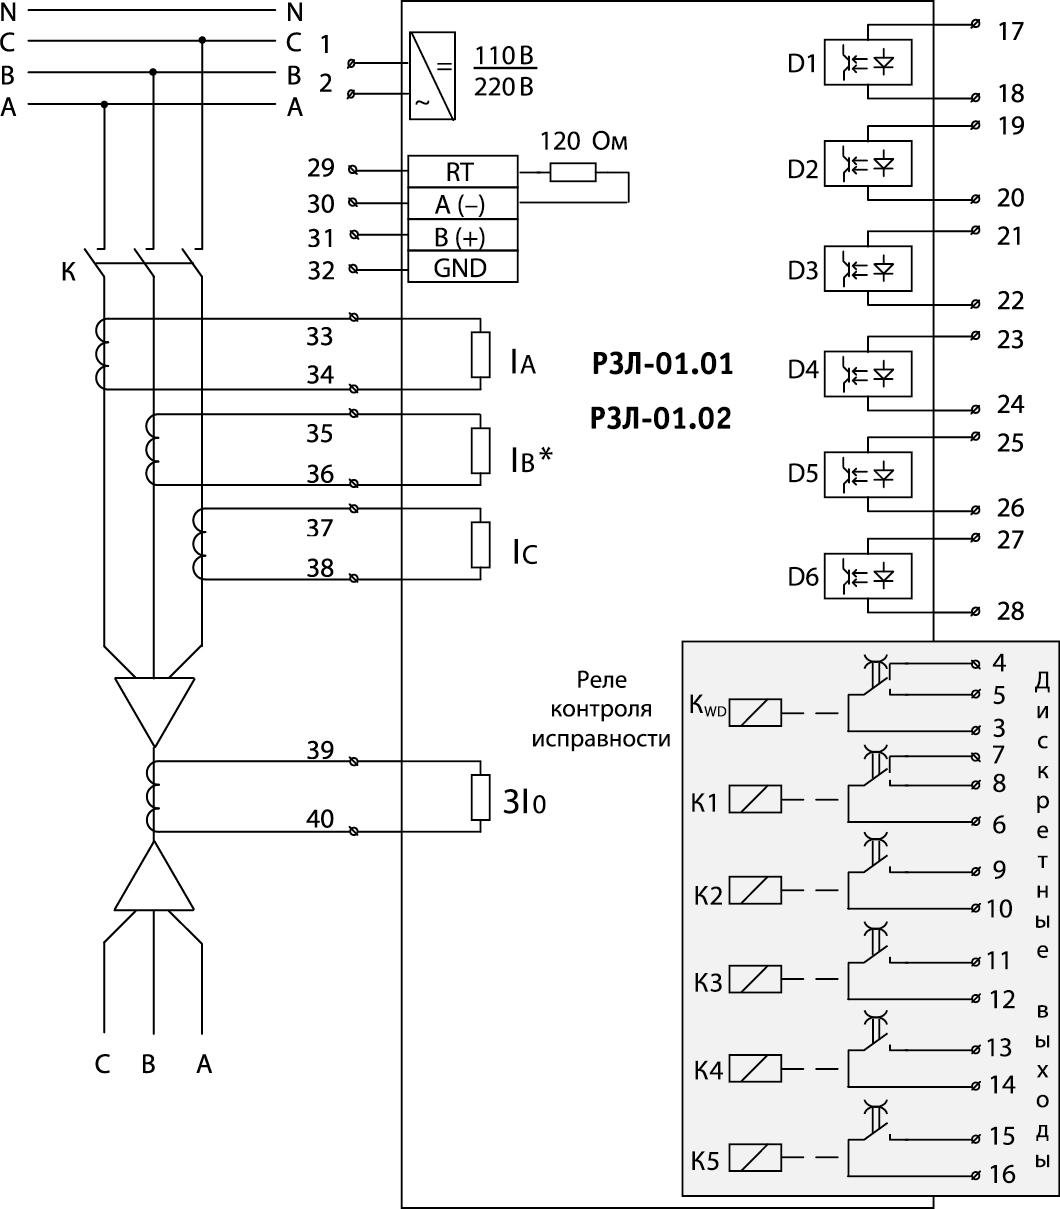 РЗЛ-01.01, РЗЛ-01.02 - схема подключения